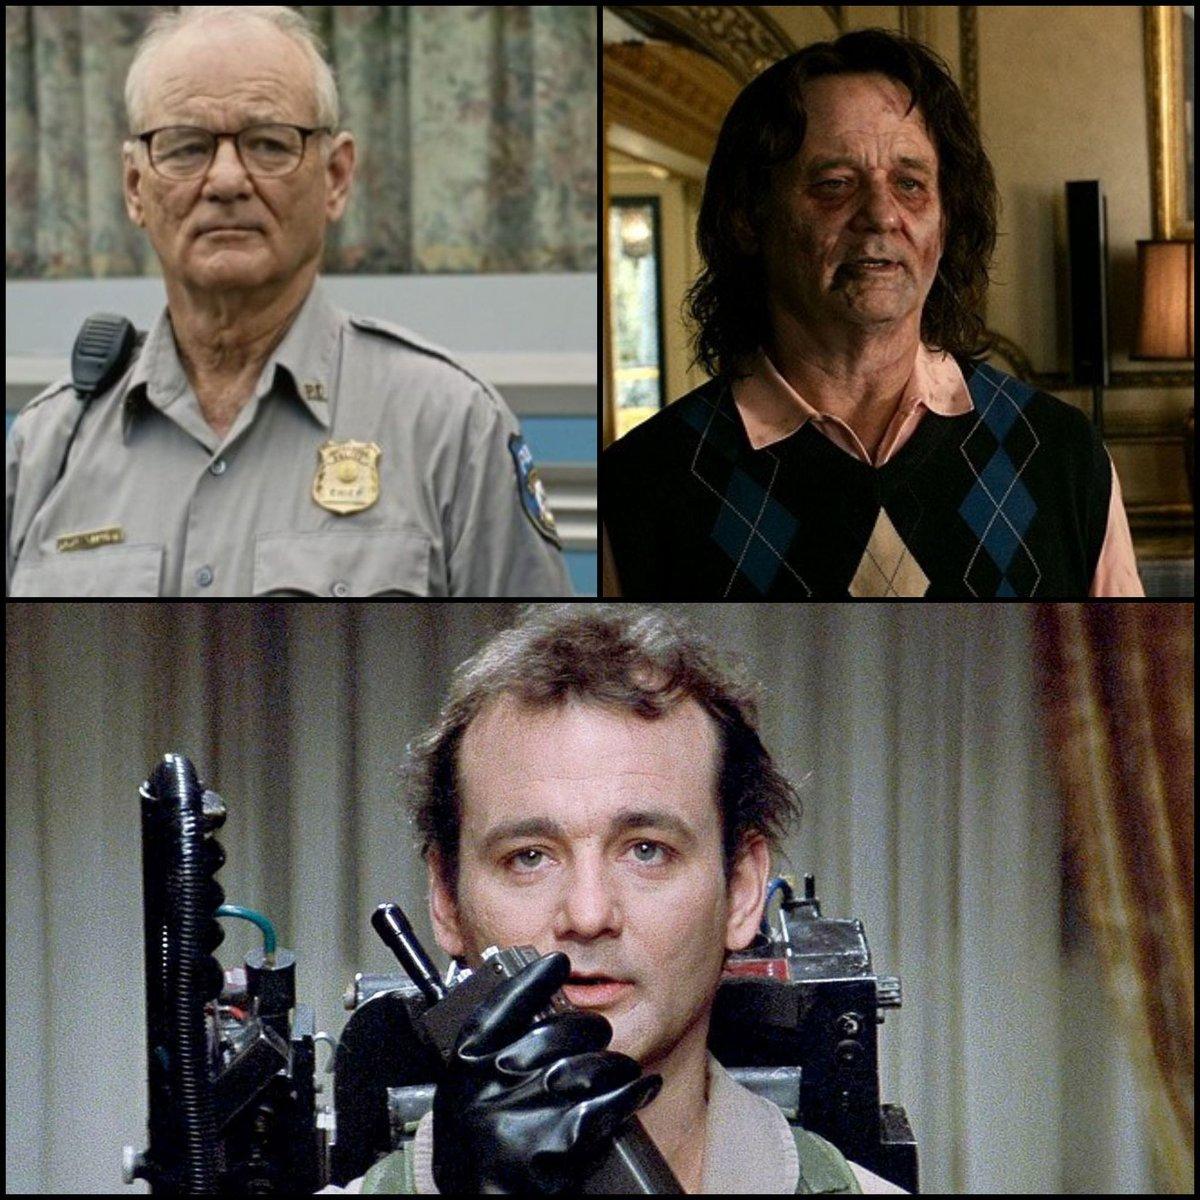 Wishing a very Happy Birthday to Bill Murray! #ghostbusters #deaddontdie #zombieland #actor #birthdayboy #happybirthday https://t.co/TbtfxmlikT